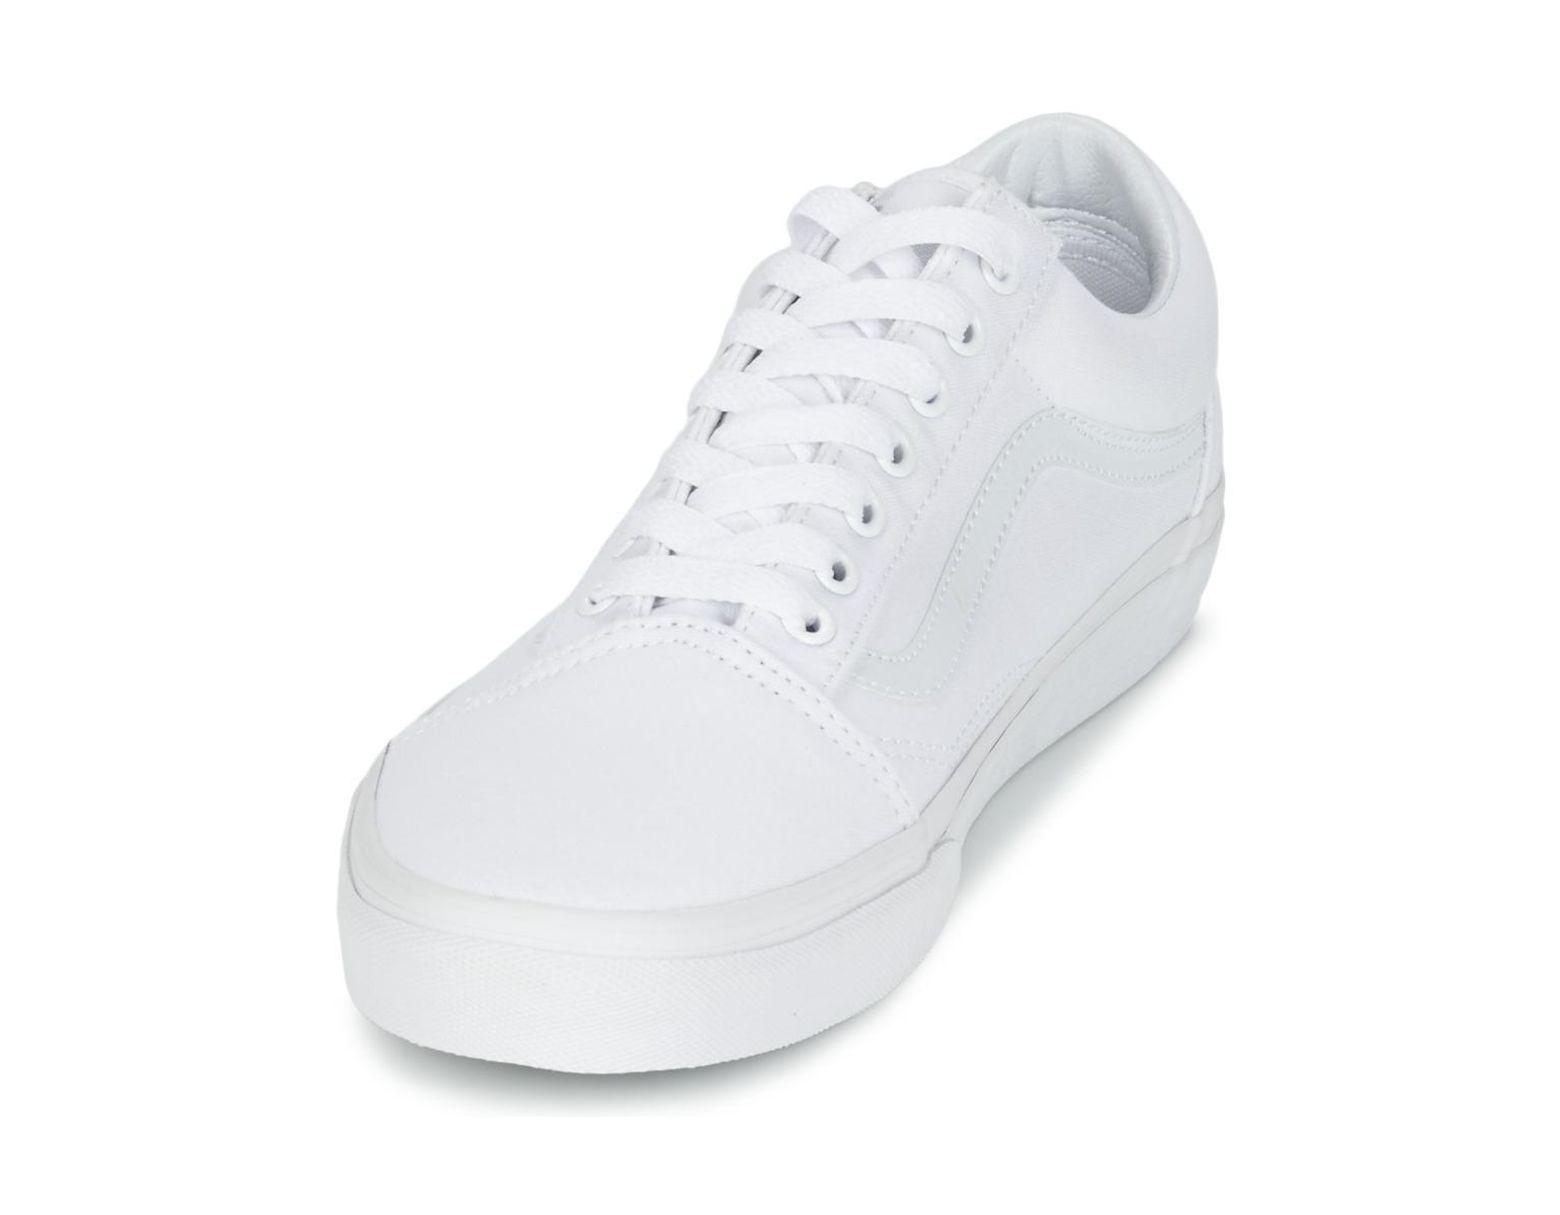 Skool Old Chaussures Femmes Blanc En pzVUqSM